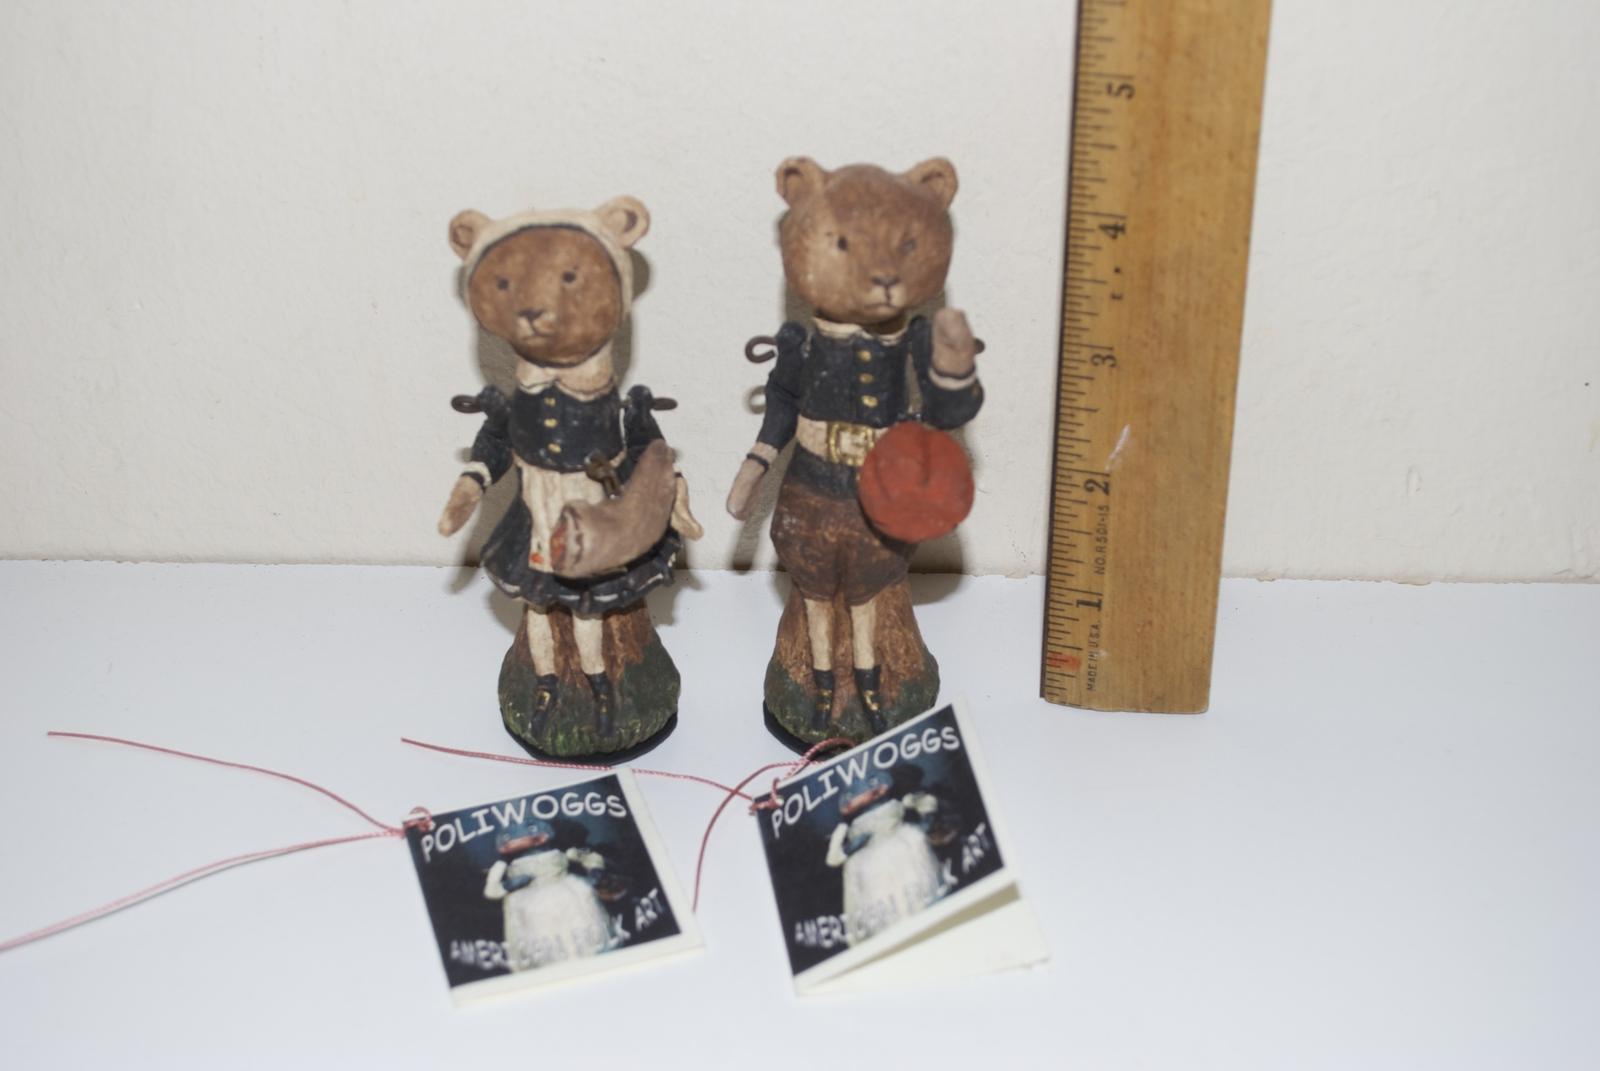 Poliwoggs American Folk Art Paper Maché Pilgrim Teddy Bears Thanksgiving 1998